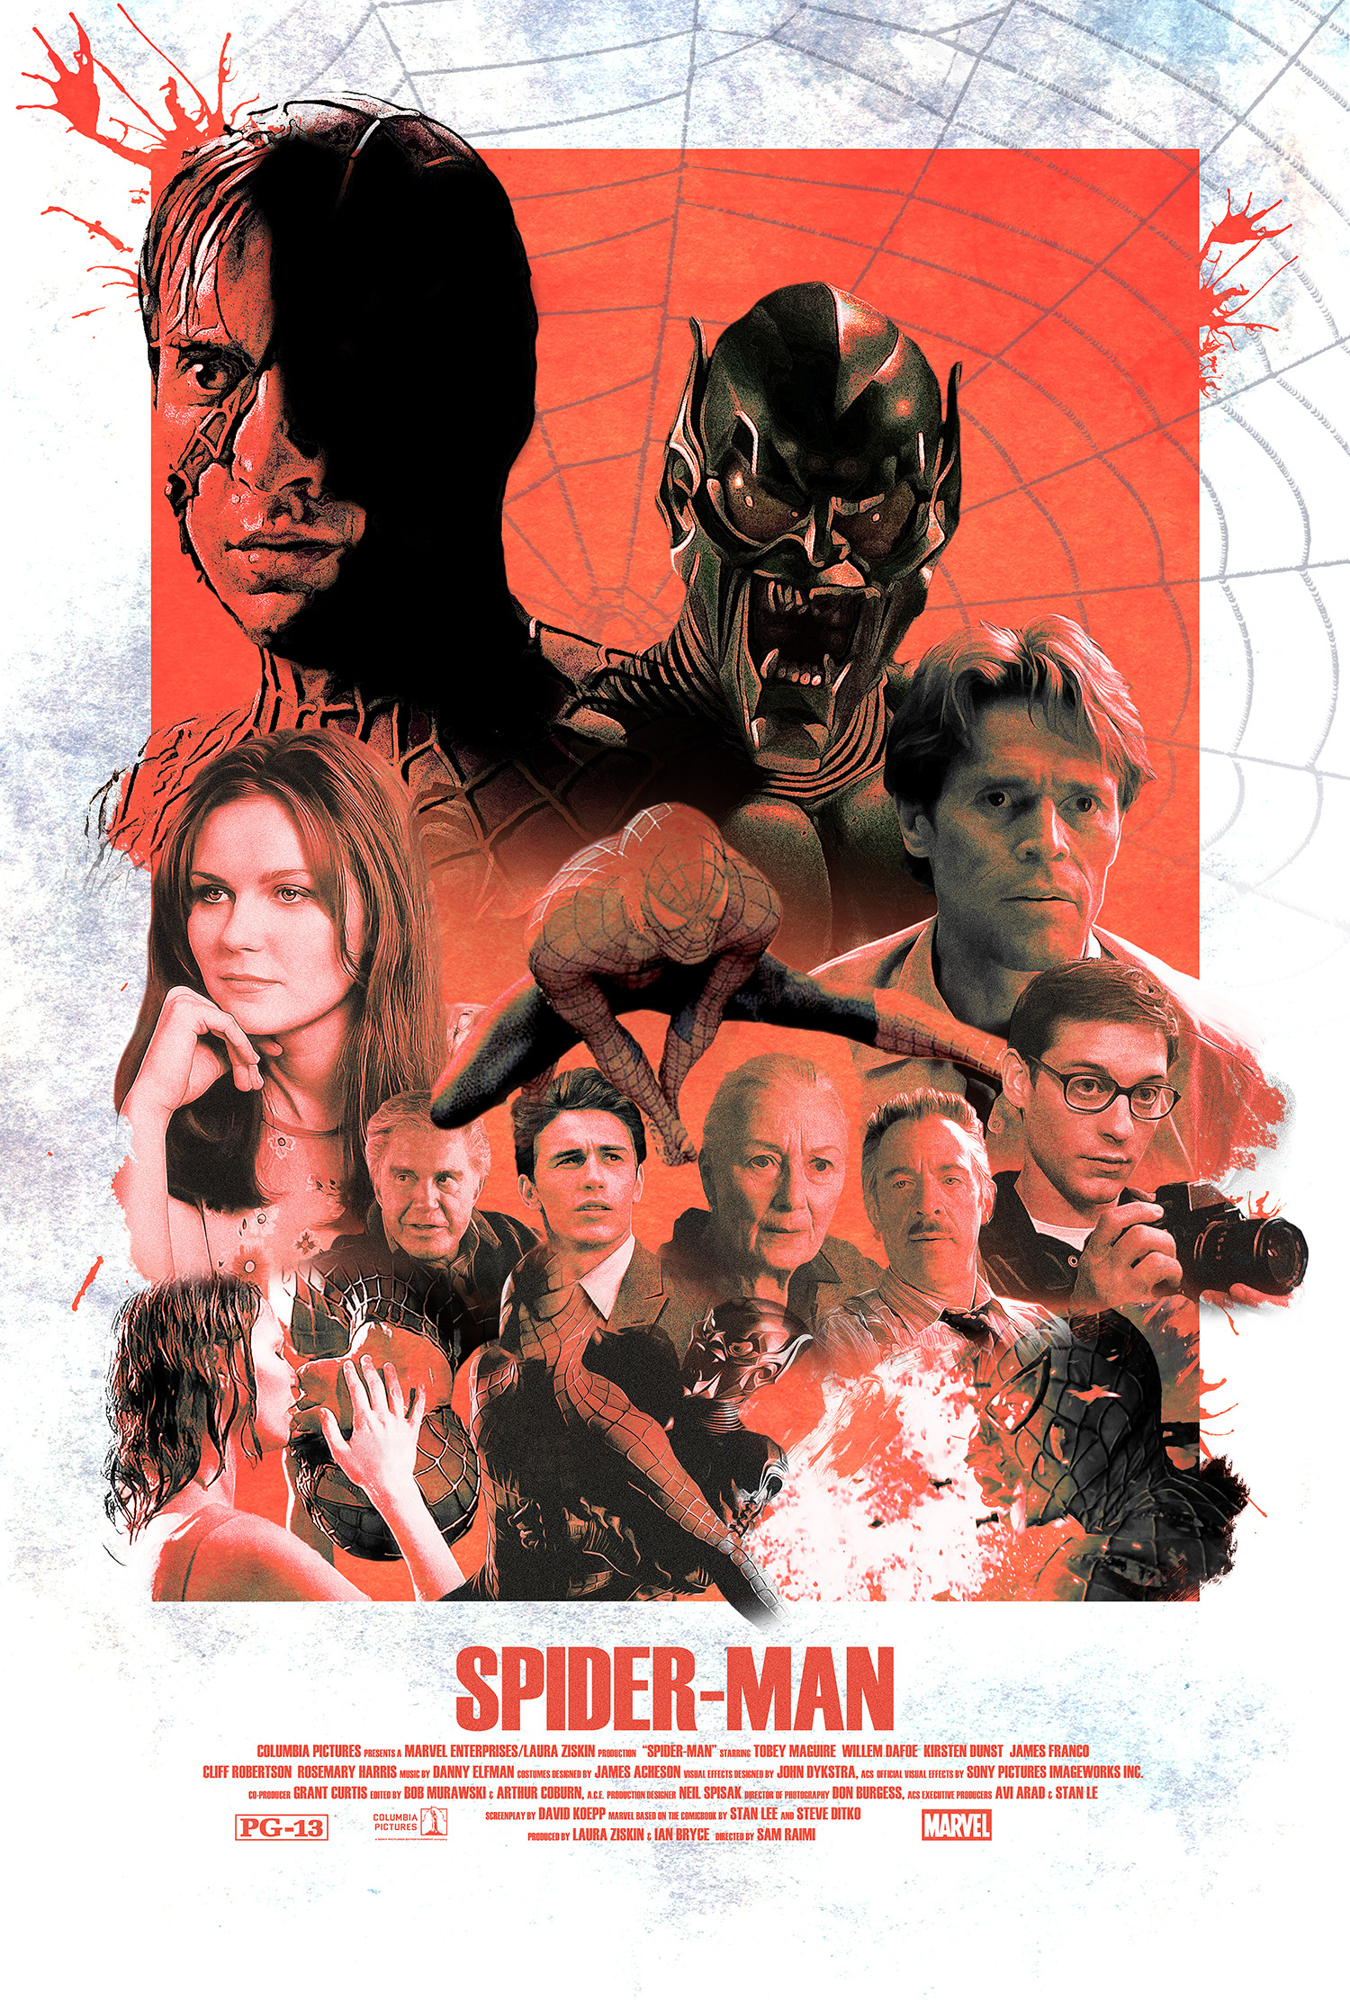 Vintage Spider Man 2002 Alternative Movie Poster Posterspy